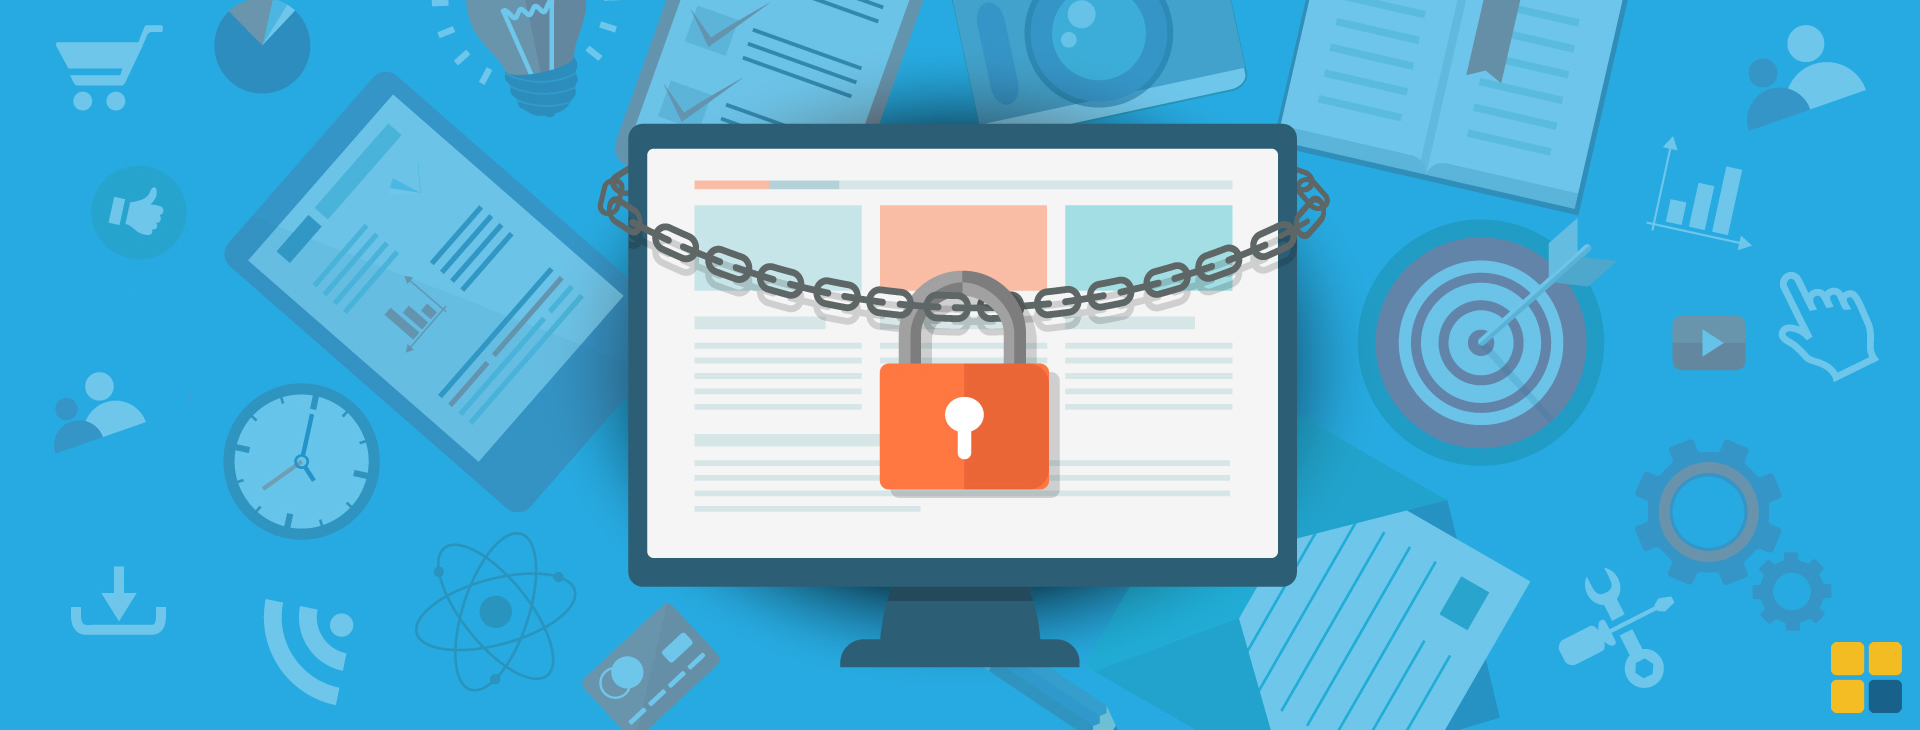 Ransomware computador criptografado